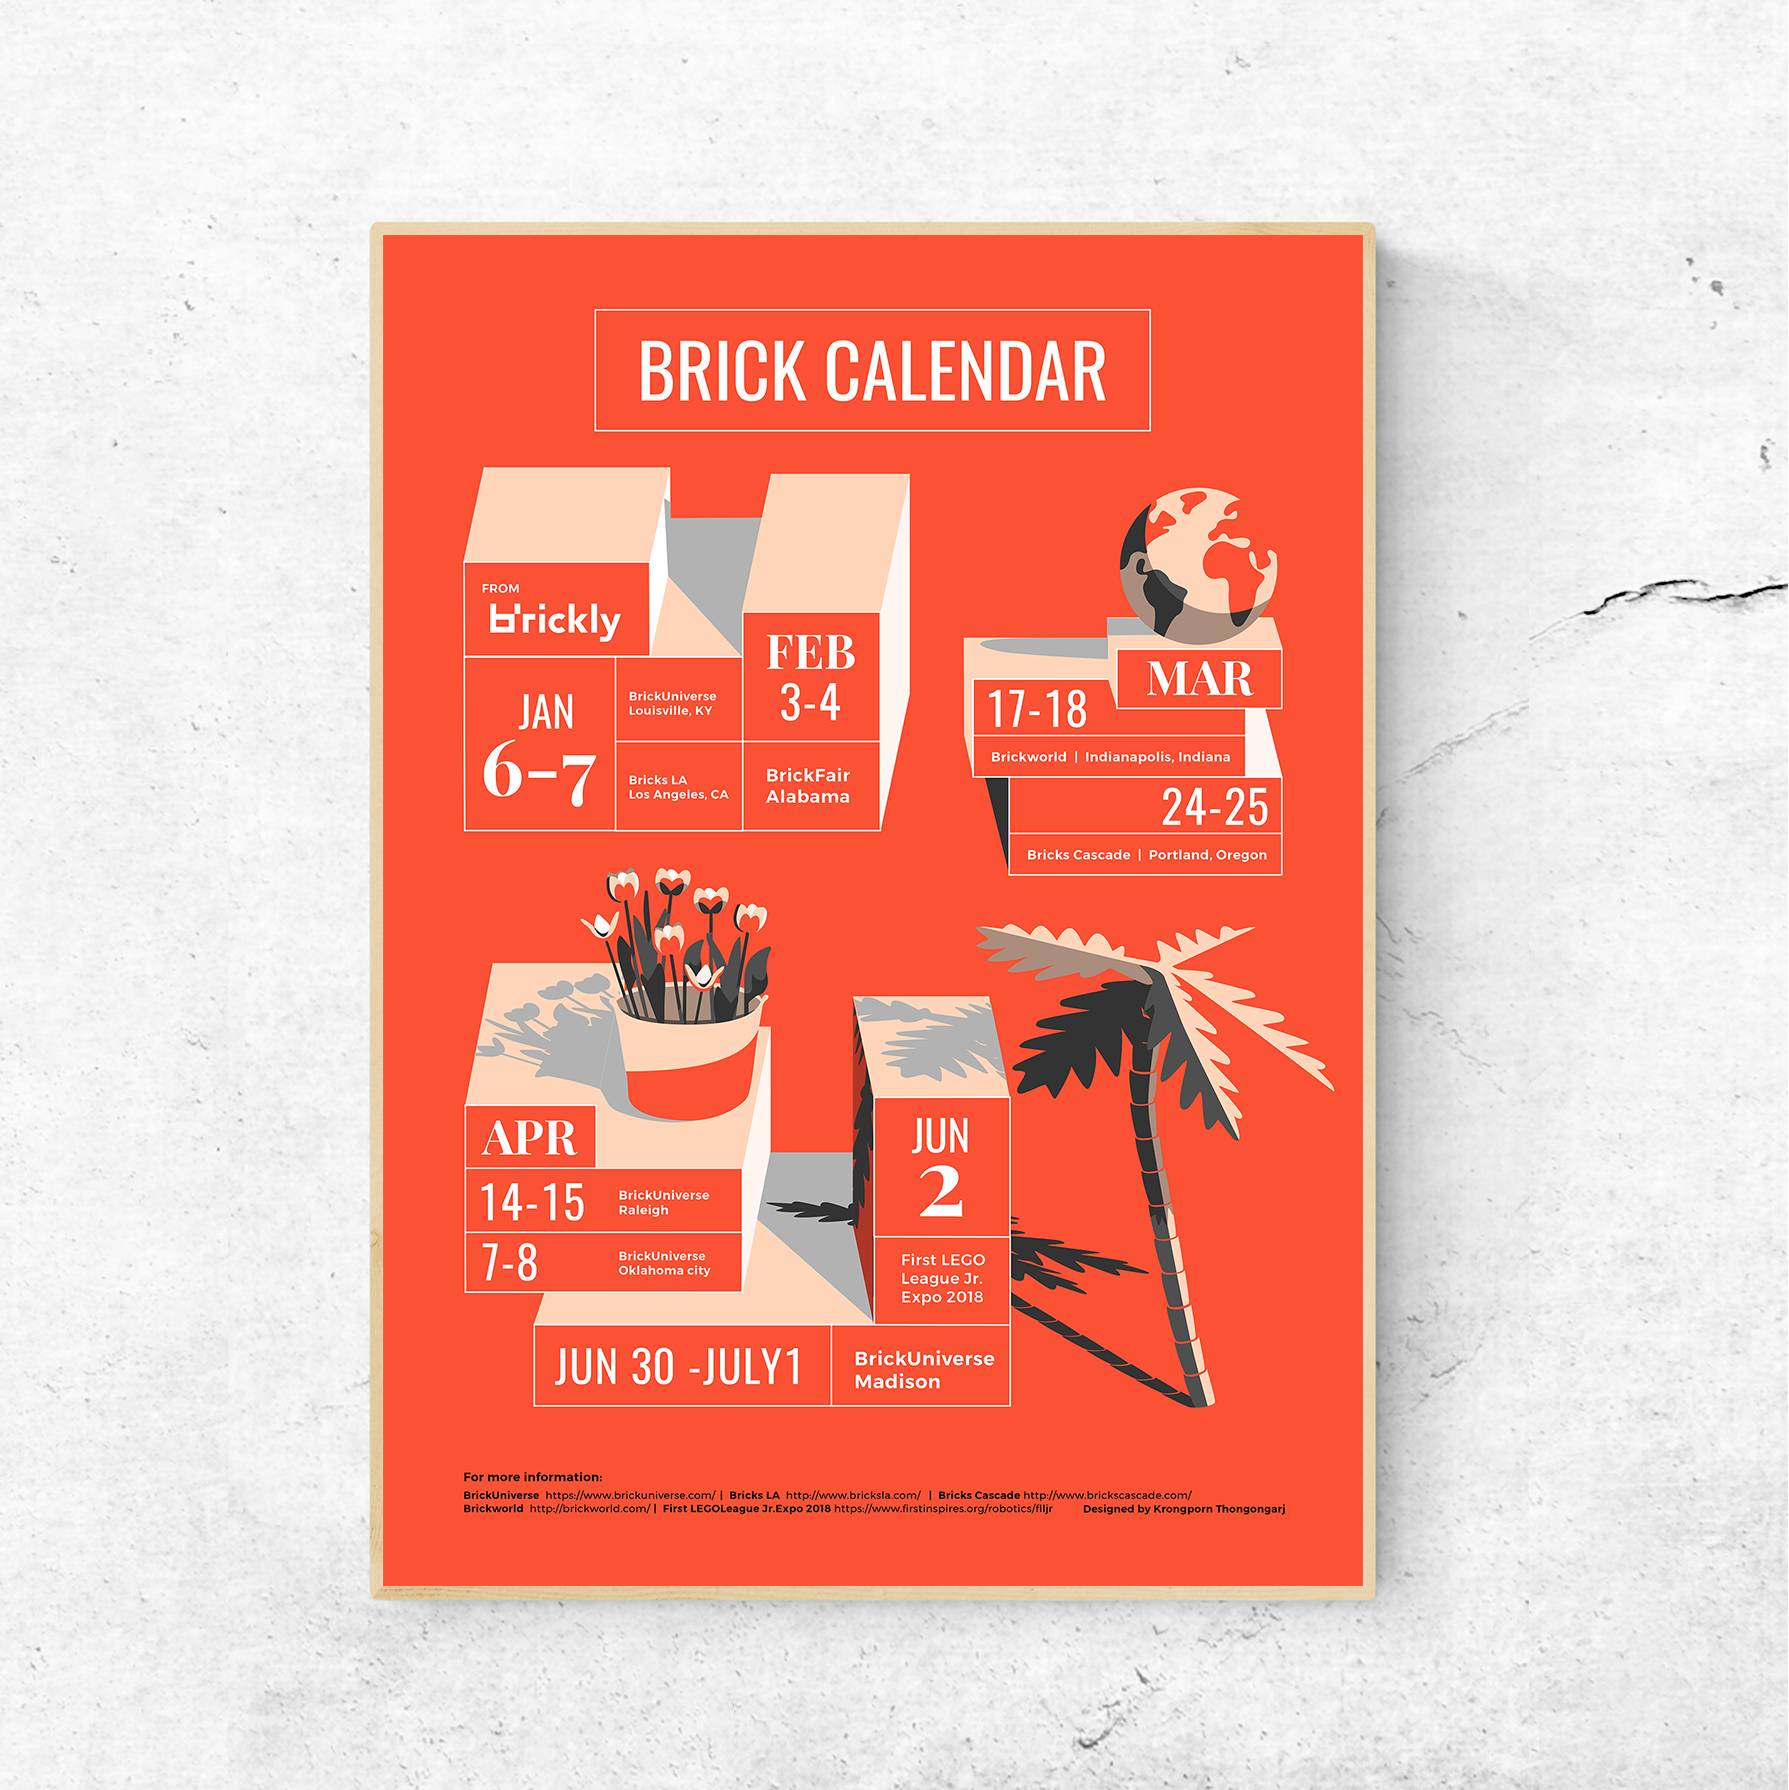 Brickly calendar mockup2.png